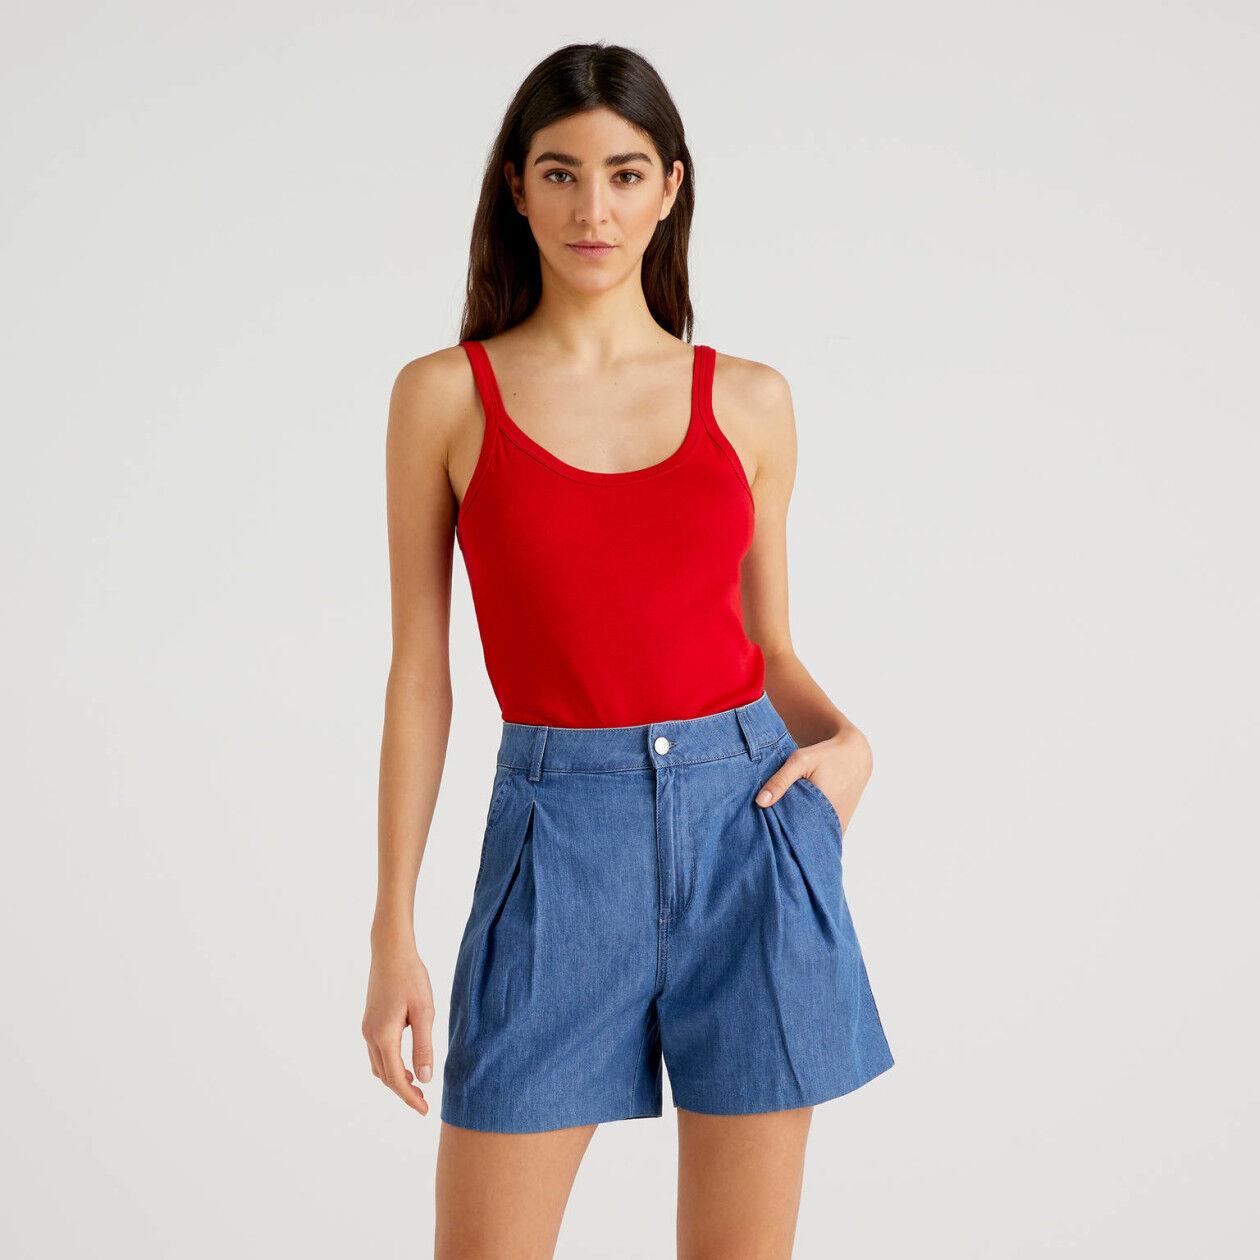 Camiseta de tirantes roja de algodón puro